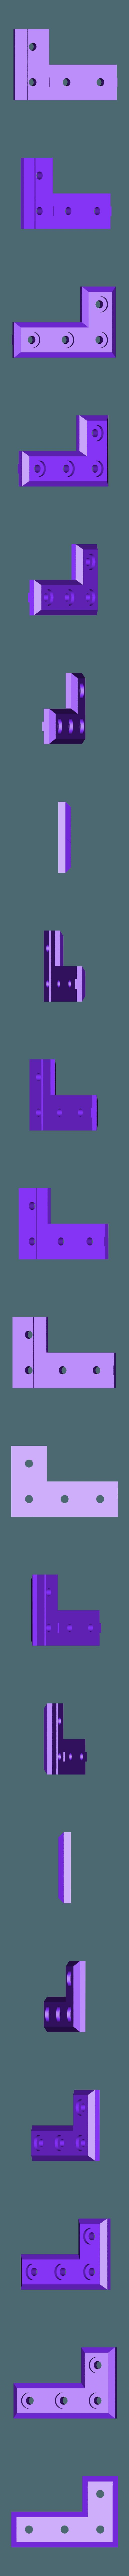 2020_Corner_PlateB_4Screw_V2.stl Download free STL file 2020 Profile Aluminum 3D Printable Erector Set • 3D printer model, adamjvr